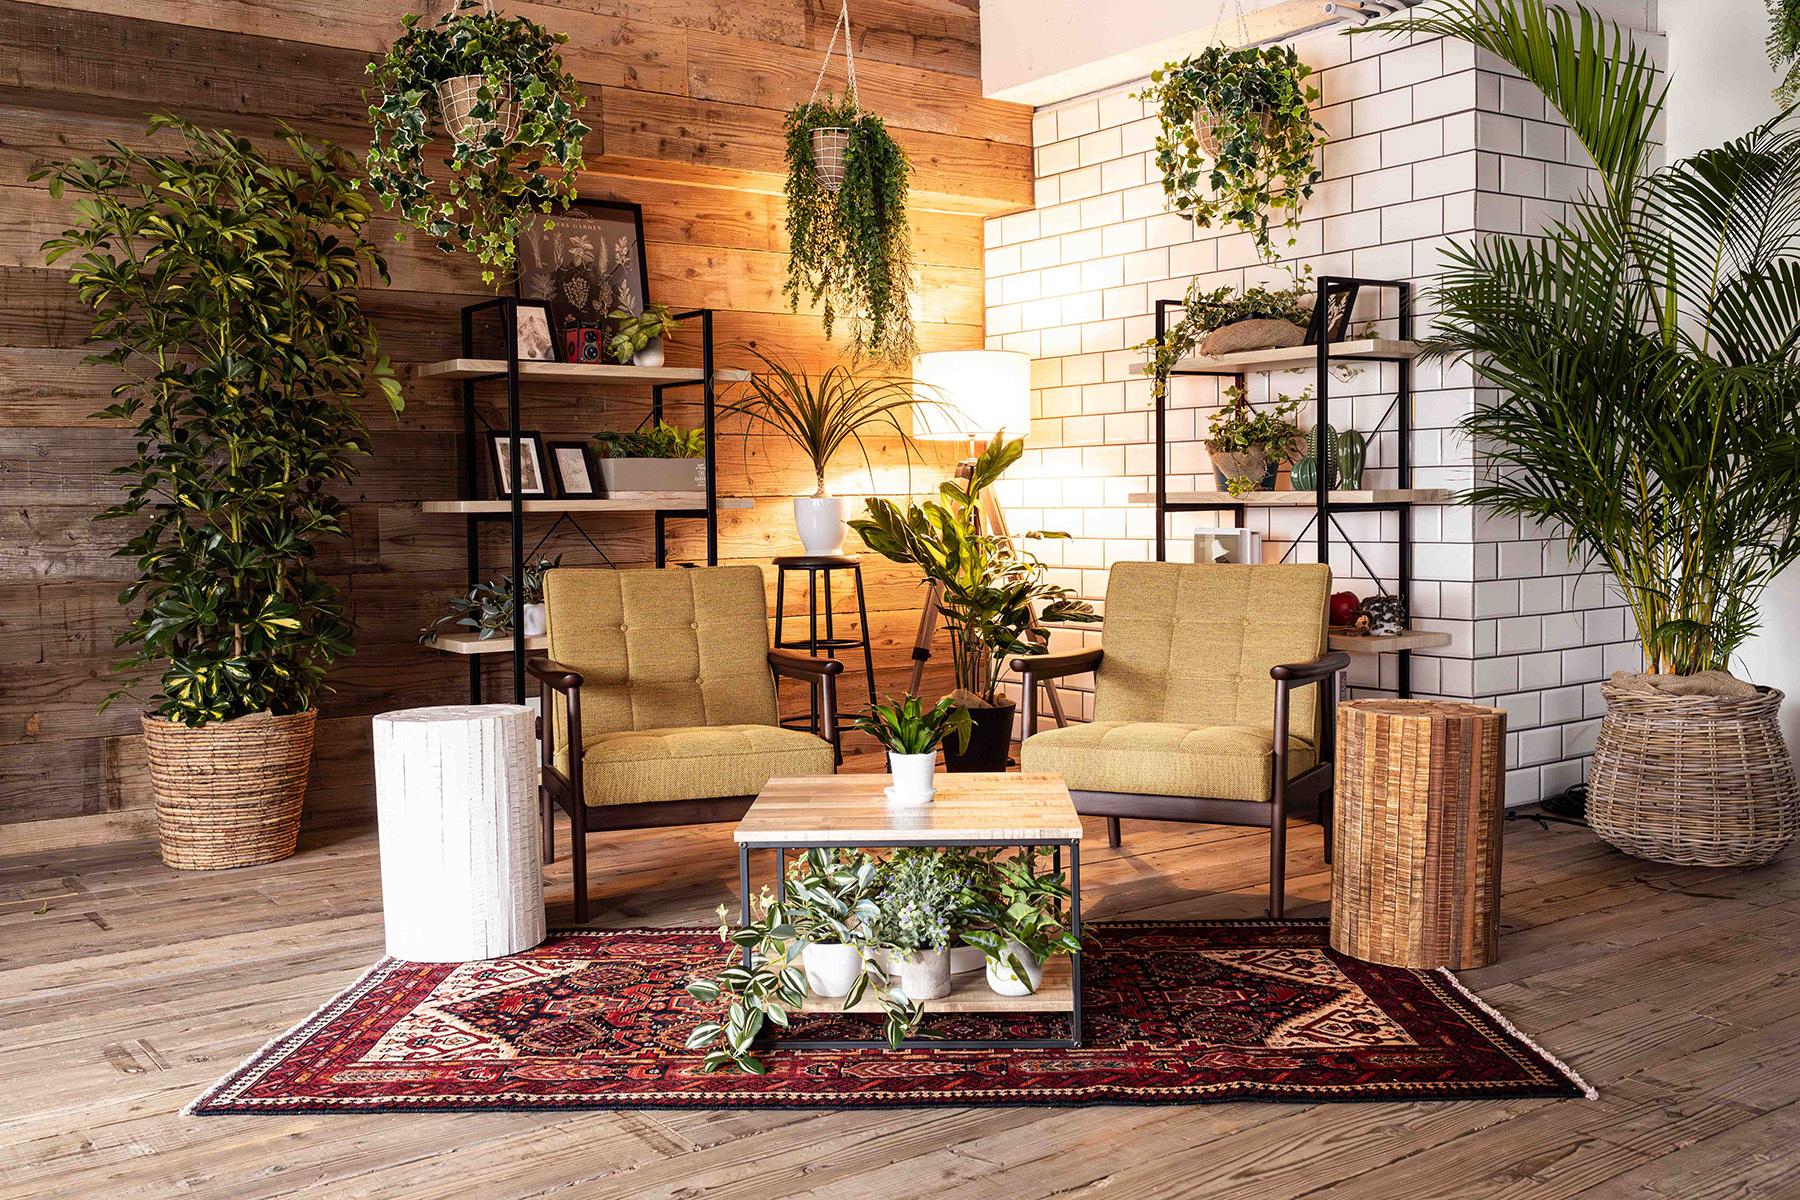 STUDIO FOXTAIL Bst (スタジオ フォックステイル Bst)備え付けの家具や小物でアレンジ